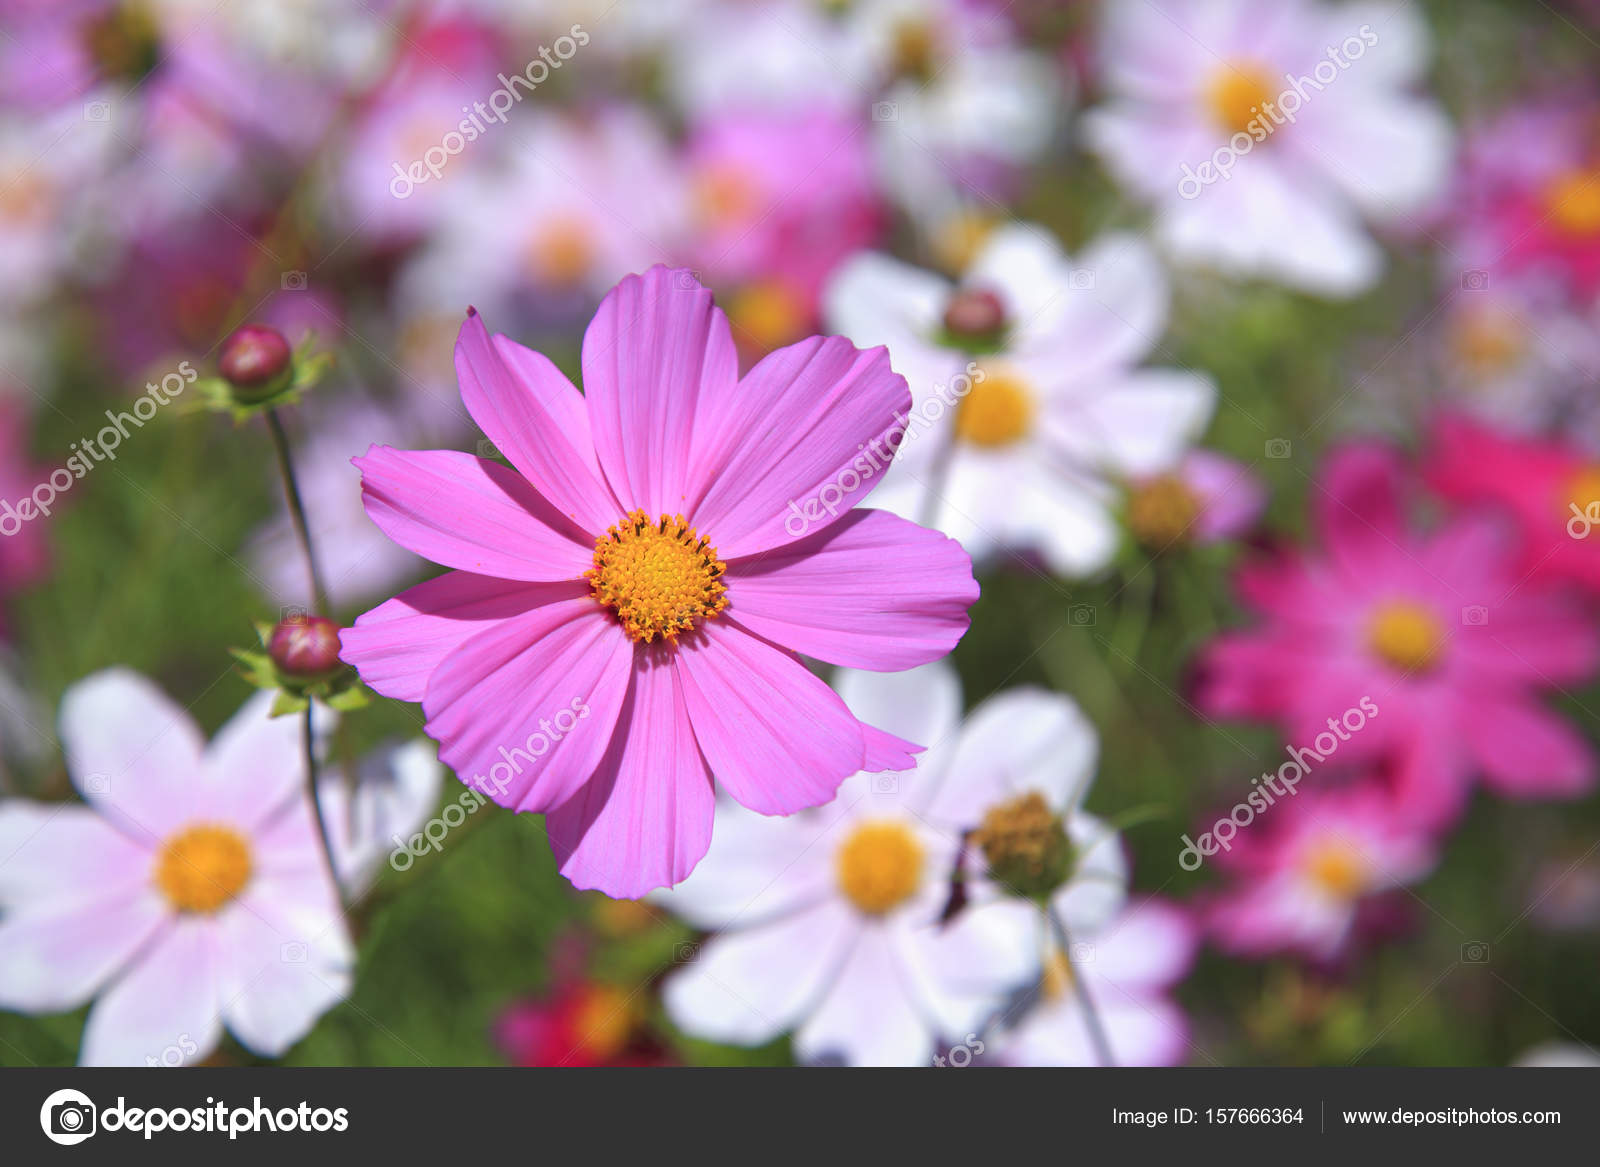 Beautiful daisy flowers stock photo topphoto 157666364 beautiful daisy flowers close up photo by topphoto izmirmasajfo Choice Image